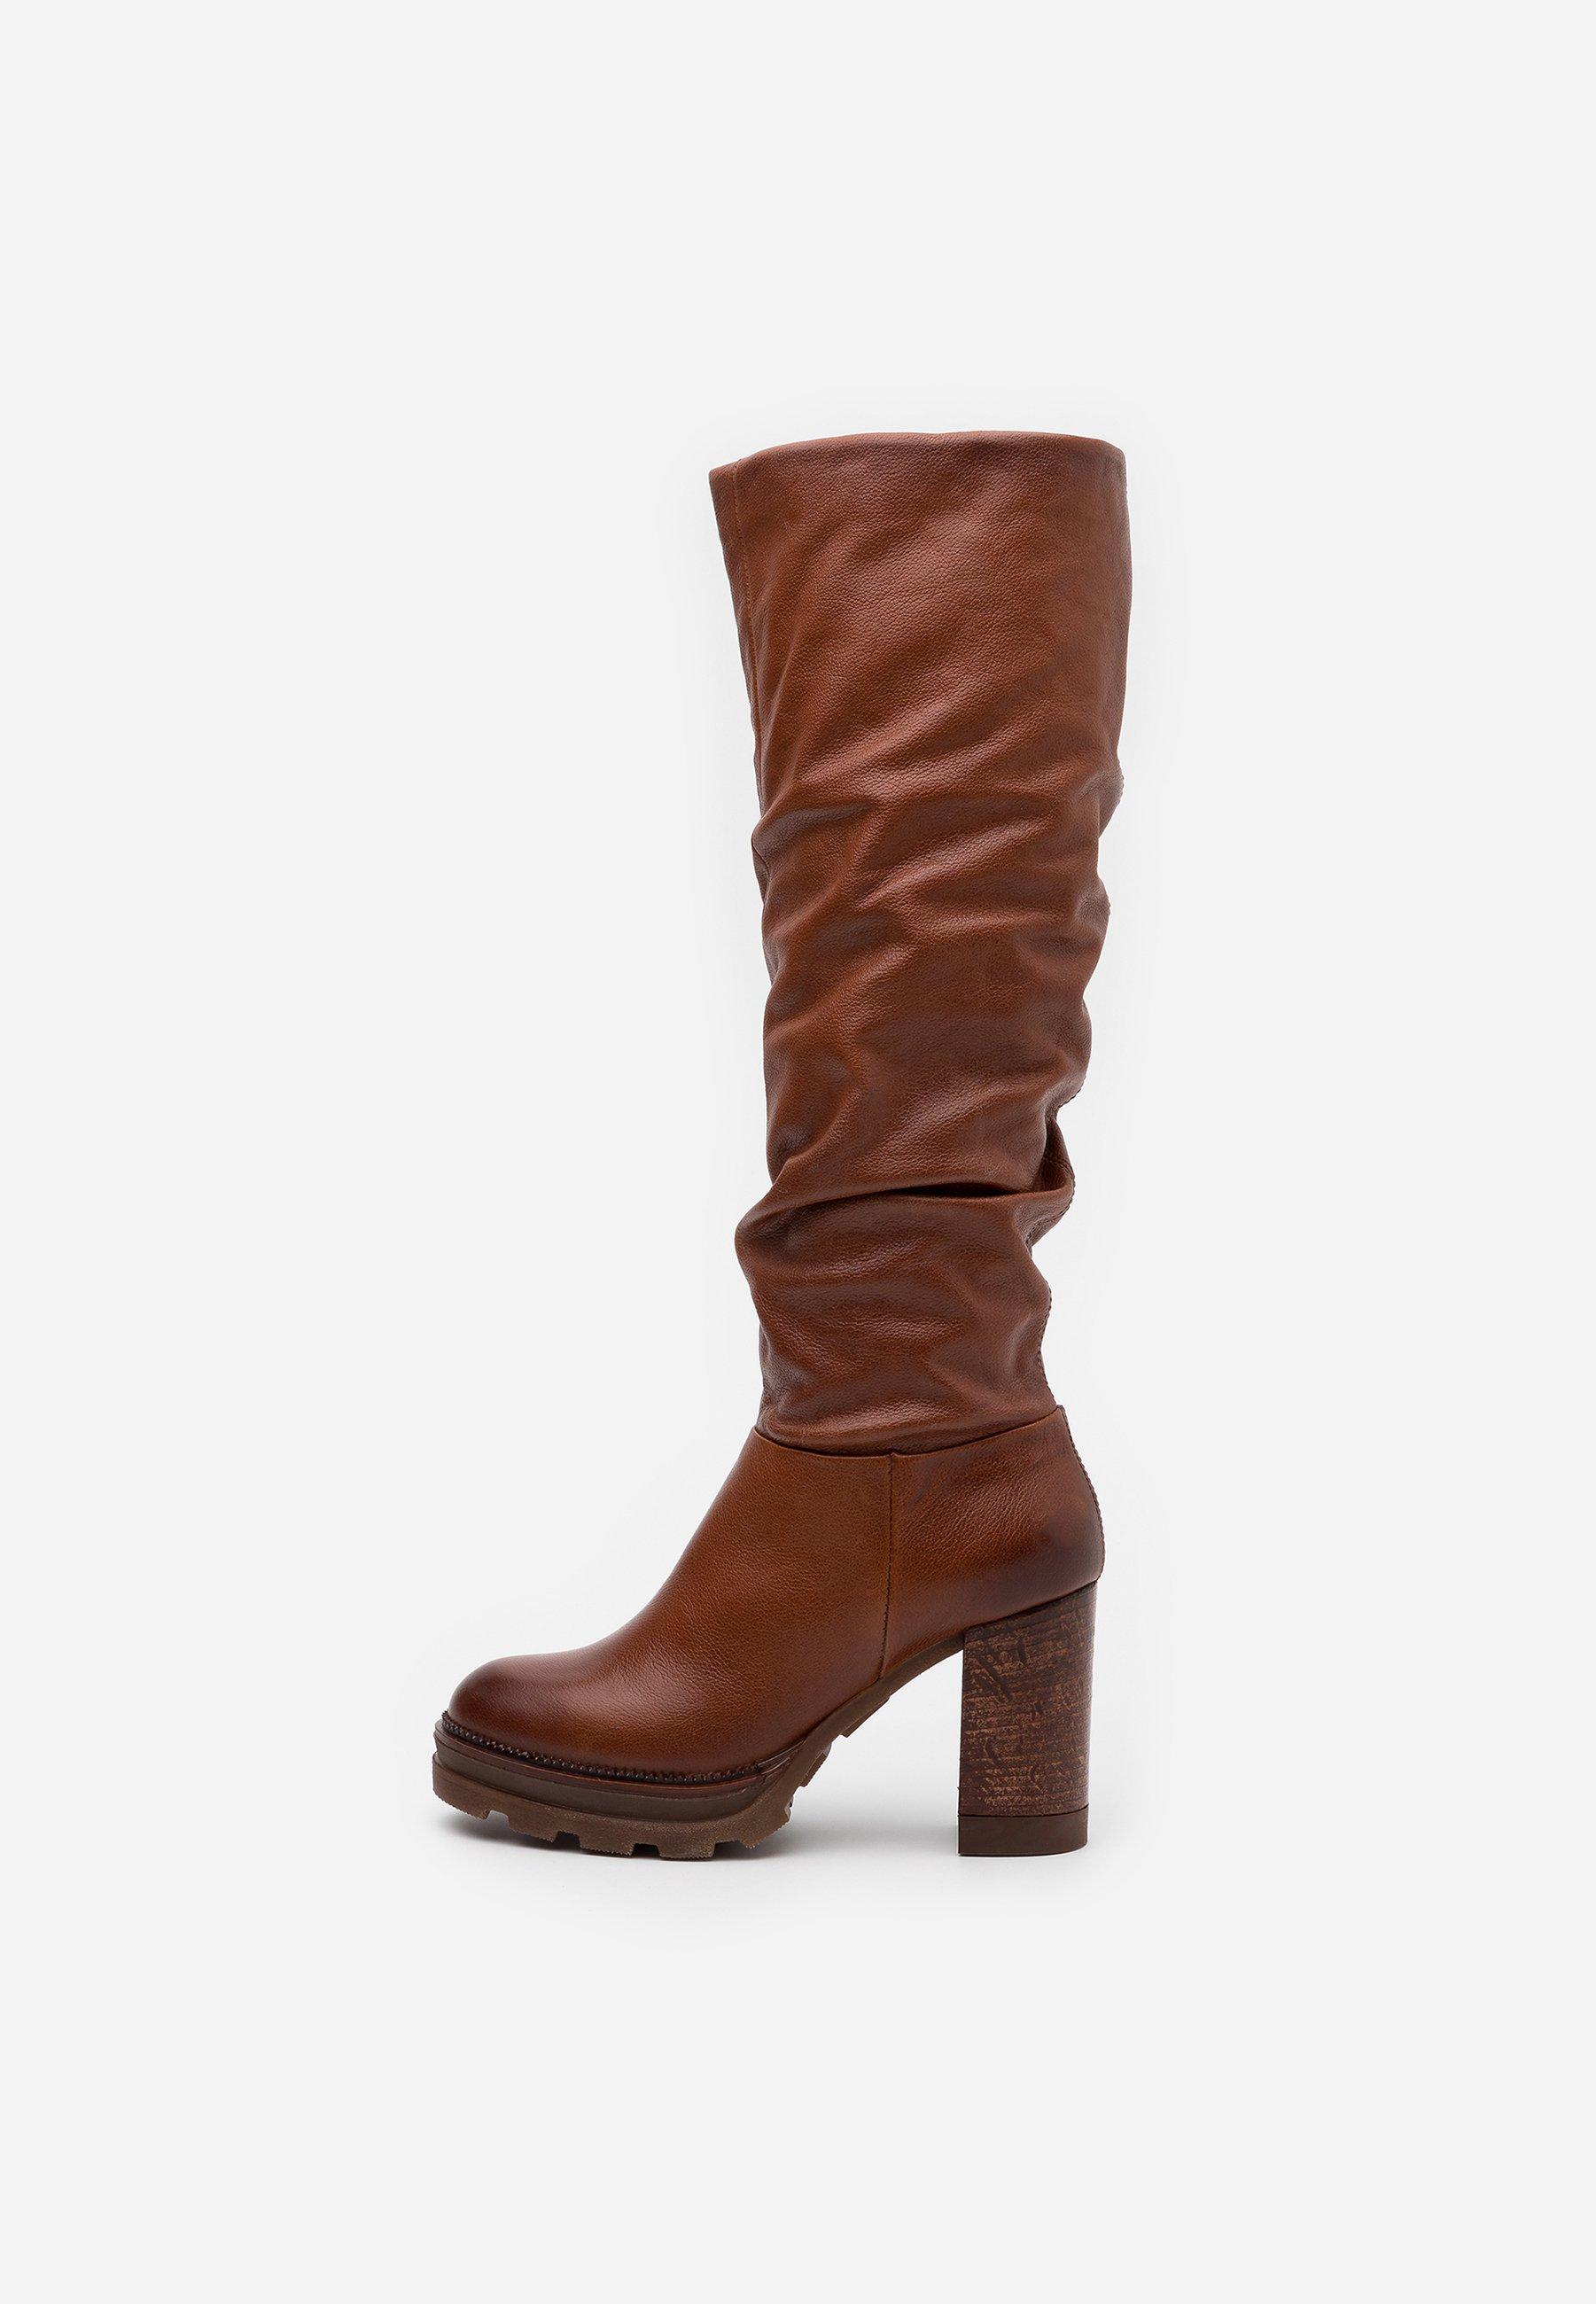 MJUS High Heel Stiefel - mustard 5dZfS1